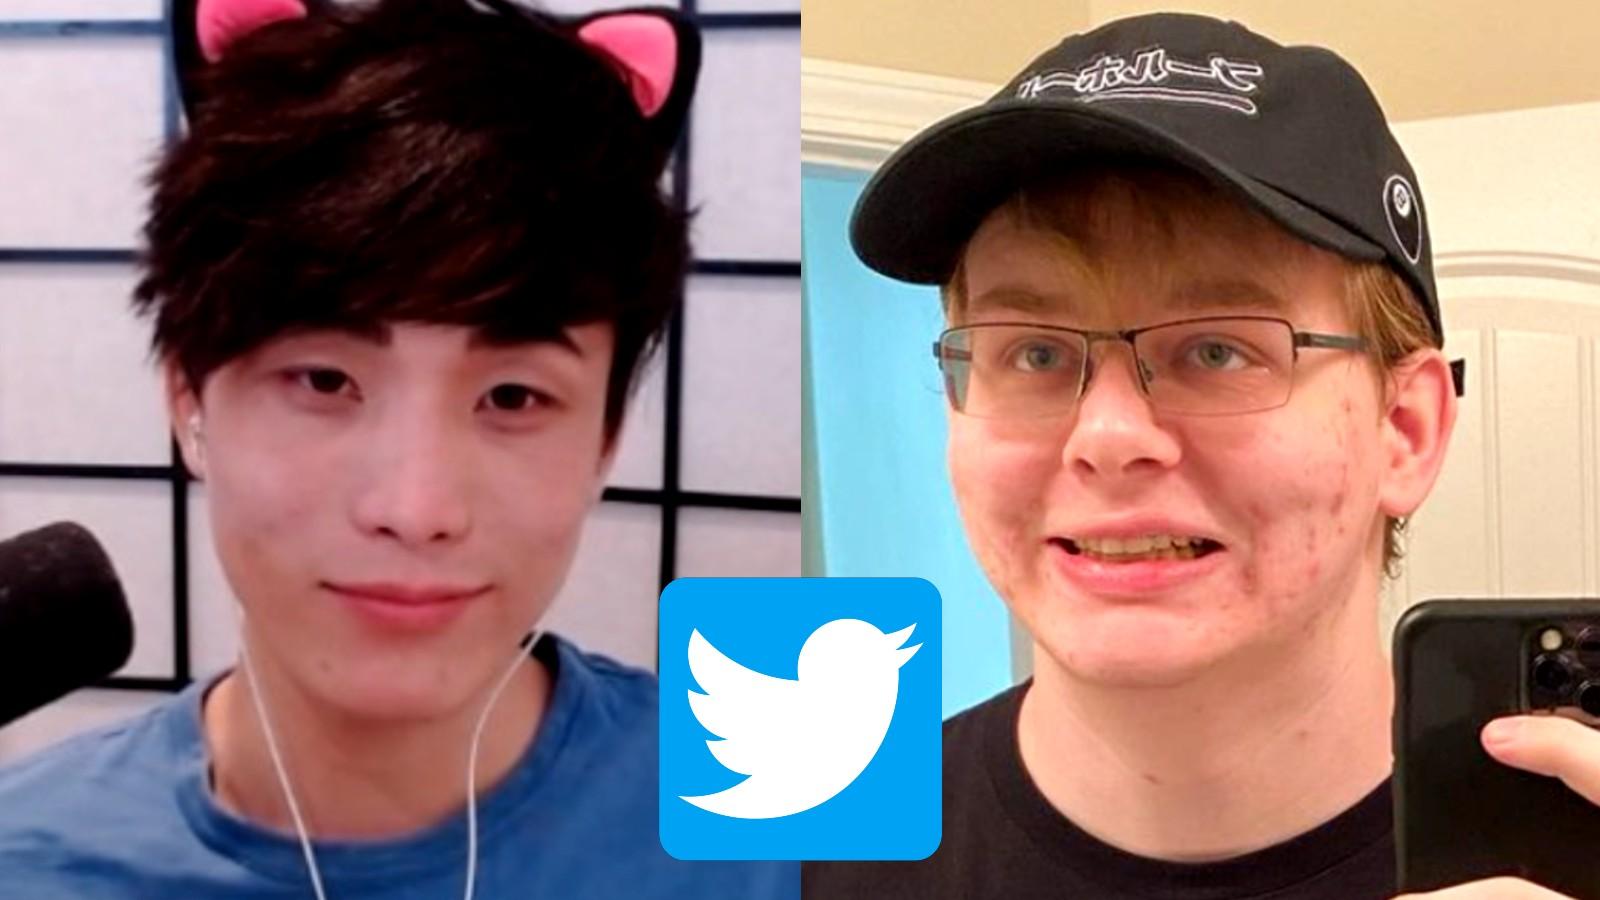 Sykkuno next to CallMeCarson alongside the Twitter logo